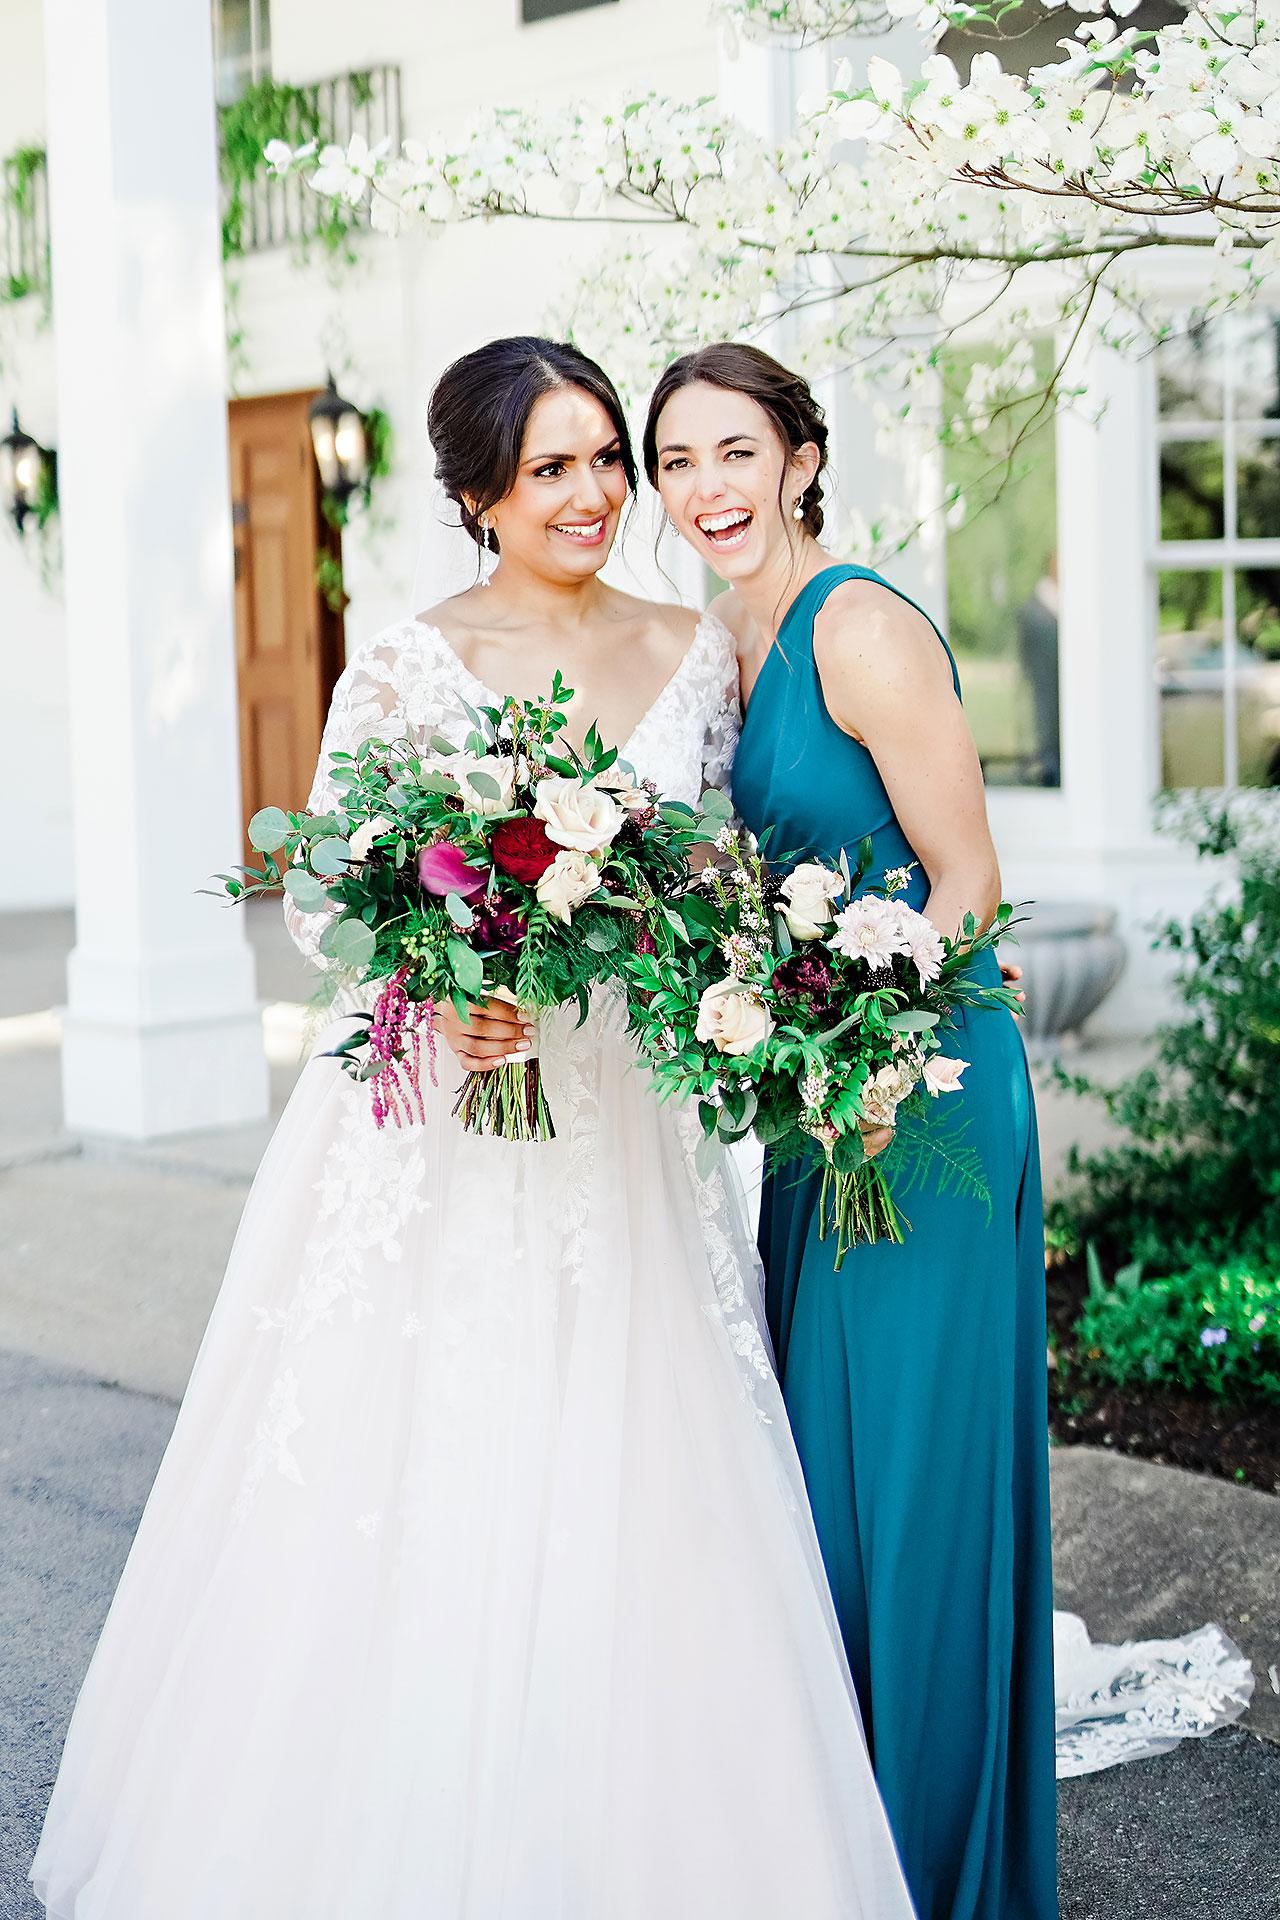 Nadia Parker Black Iris Estate Carmel Indiana Wedding May 2021 151